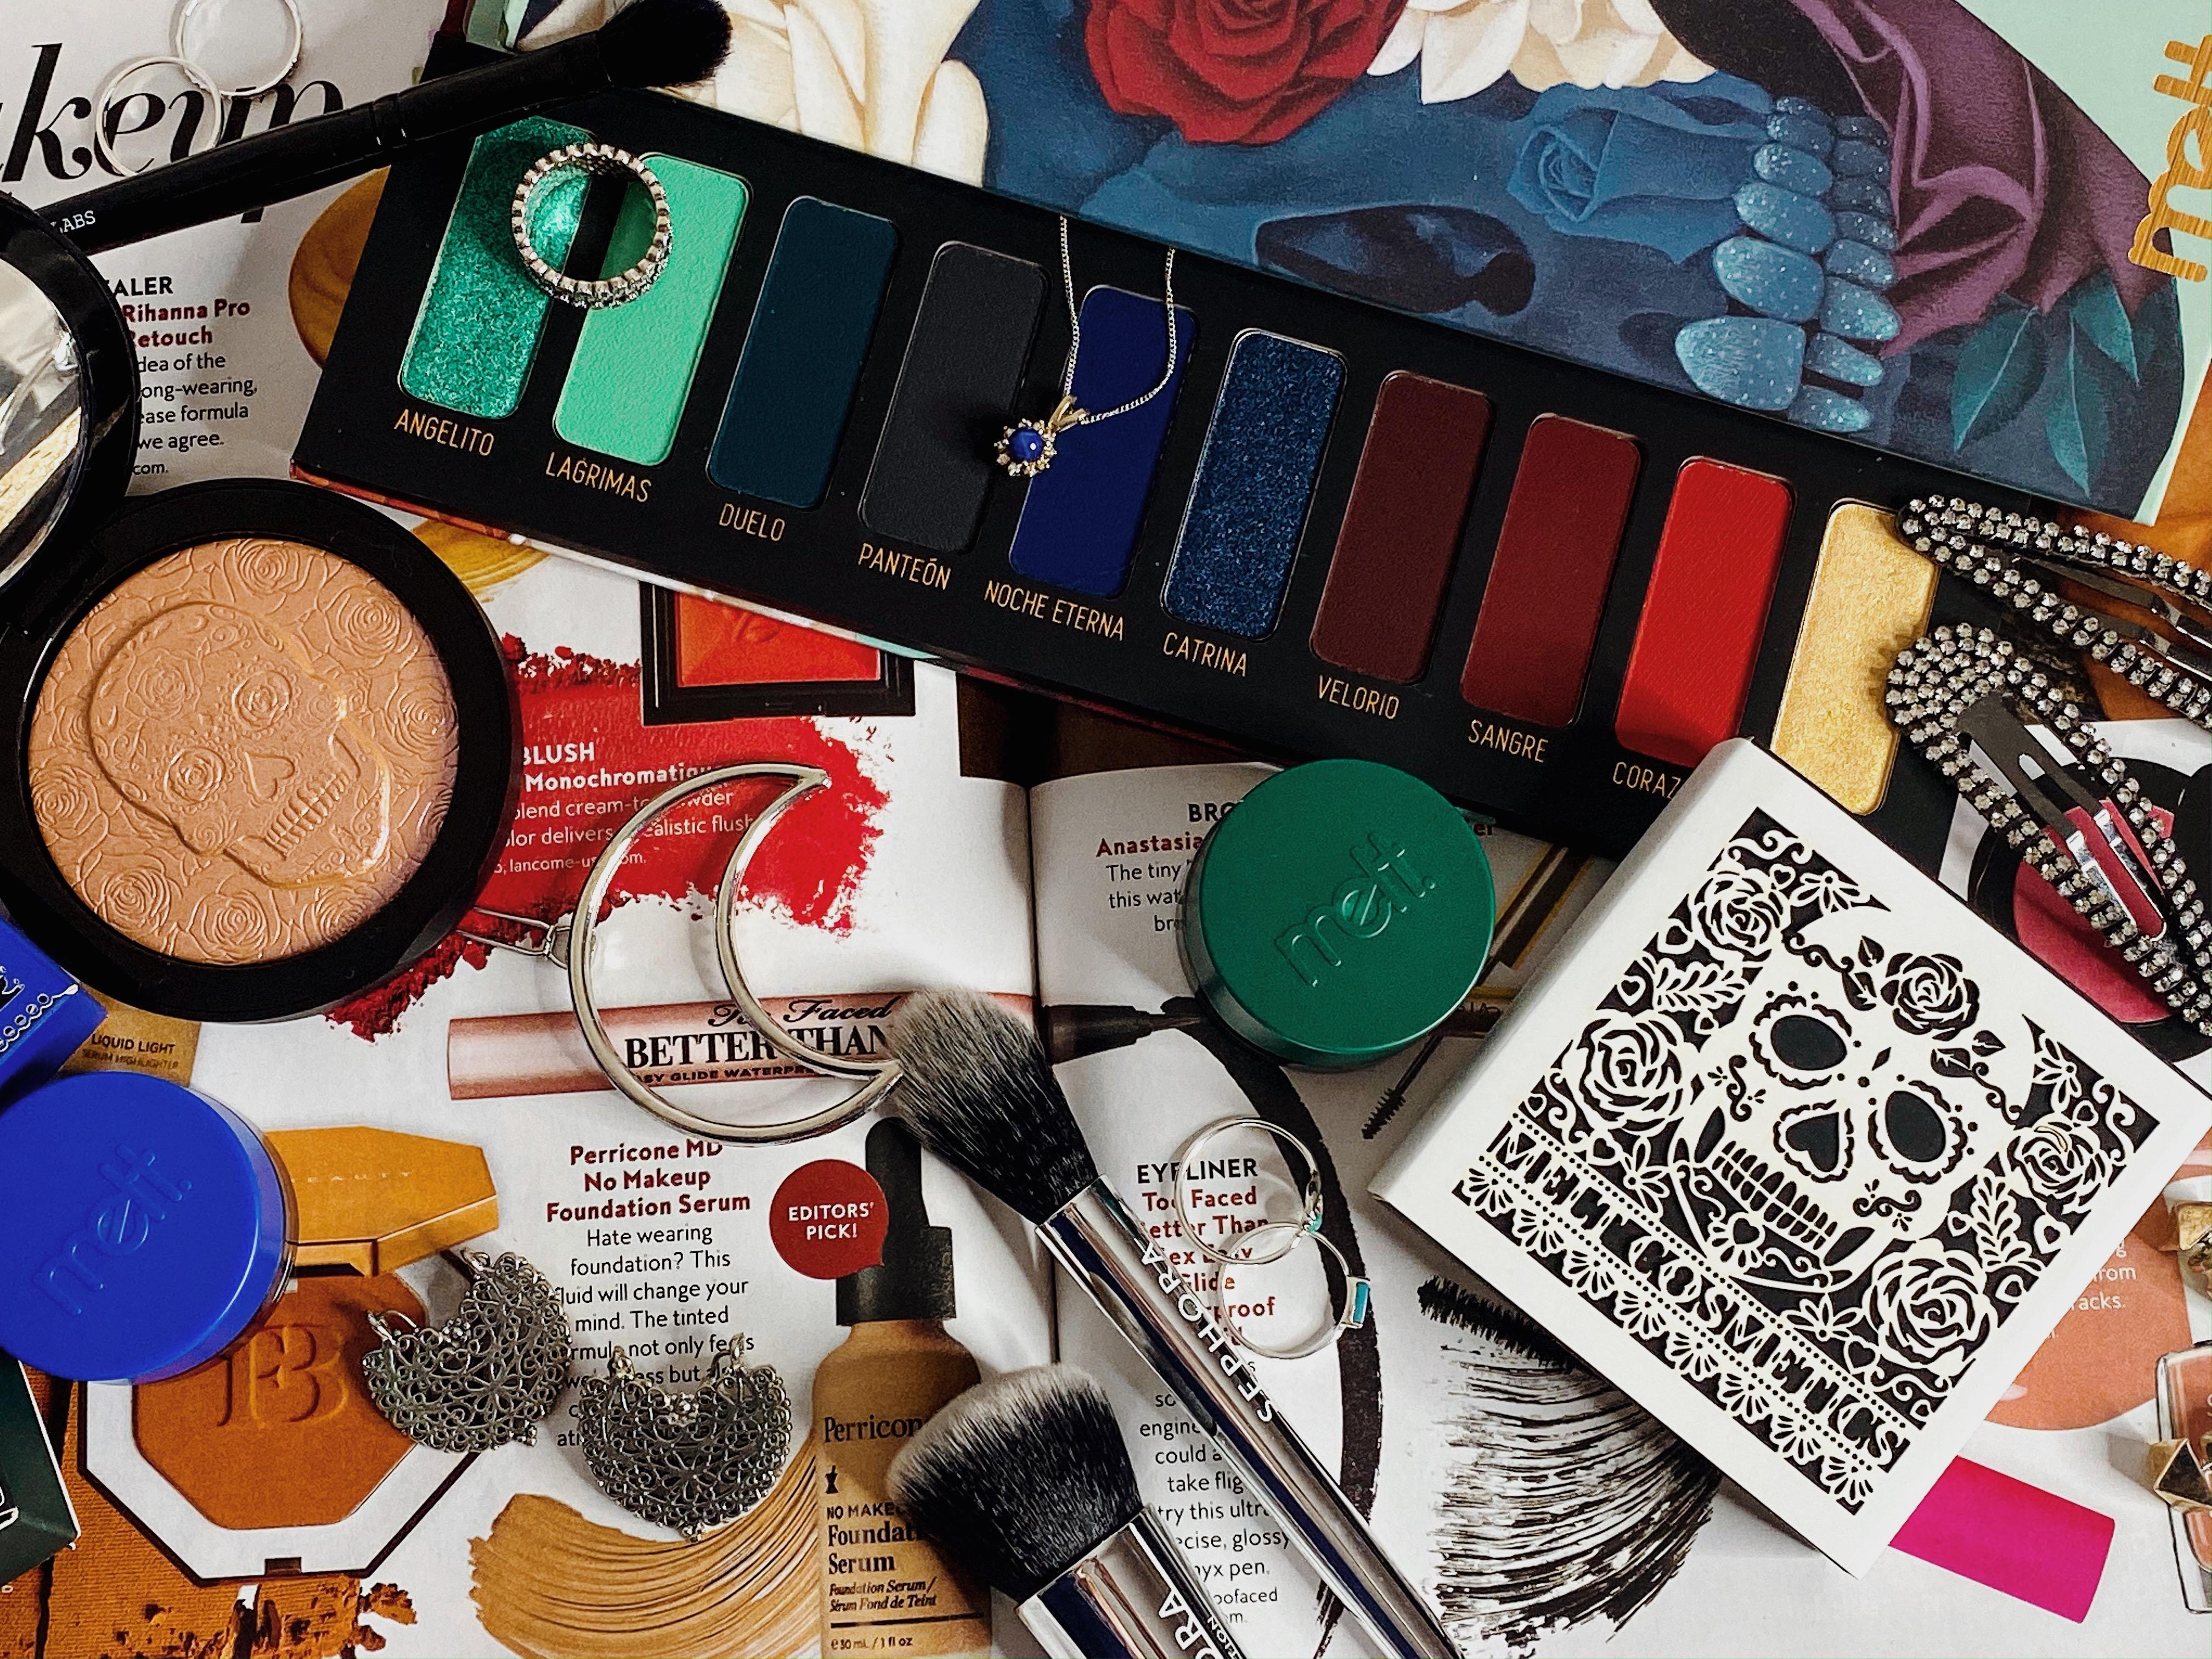 Yearlong Beauty No Buy Update #1 | Melt Amor Eterno Muerte Palette, Illuminacion Highlighter, Fortuna Gel Liner, Santos Gel Liner #5